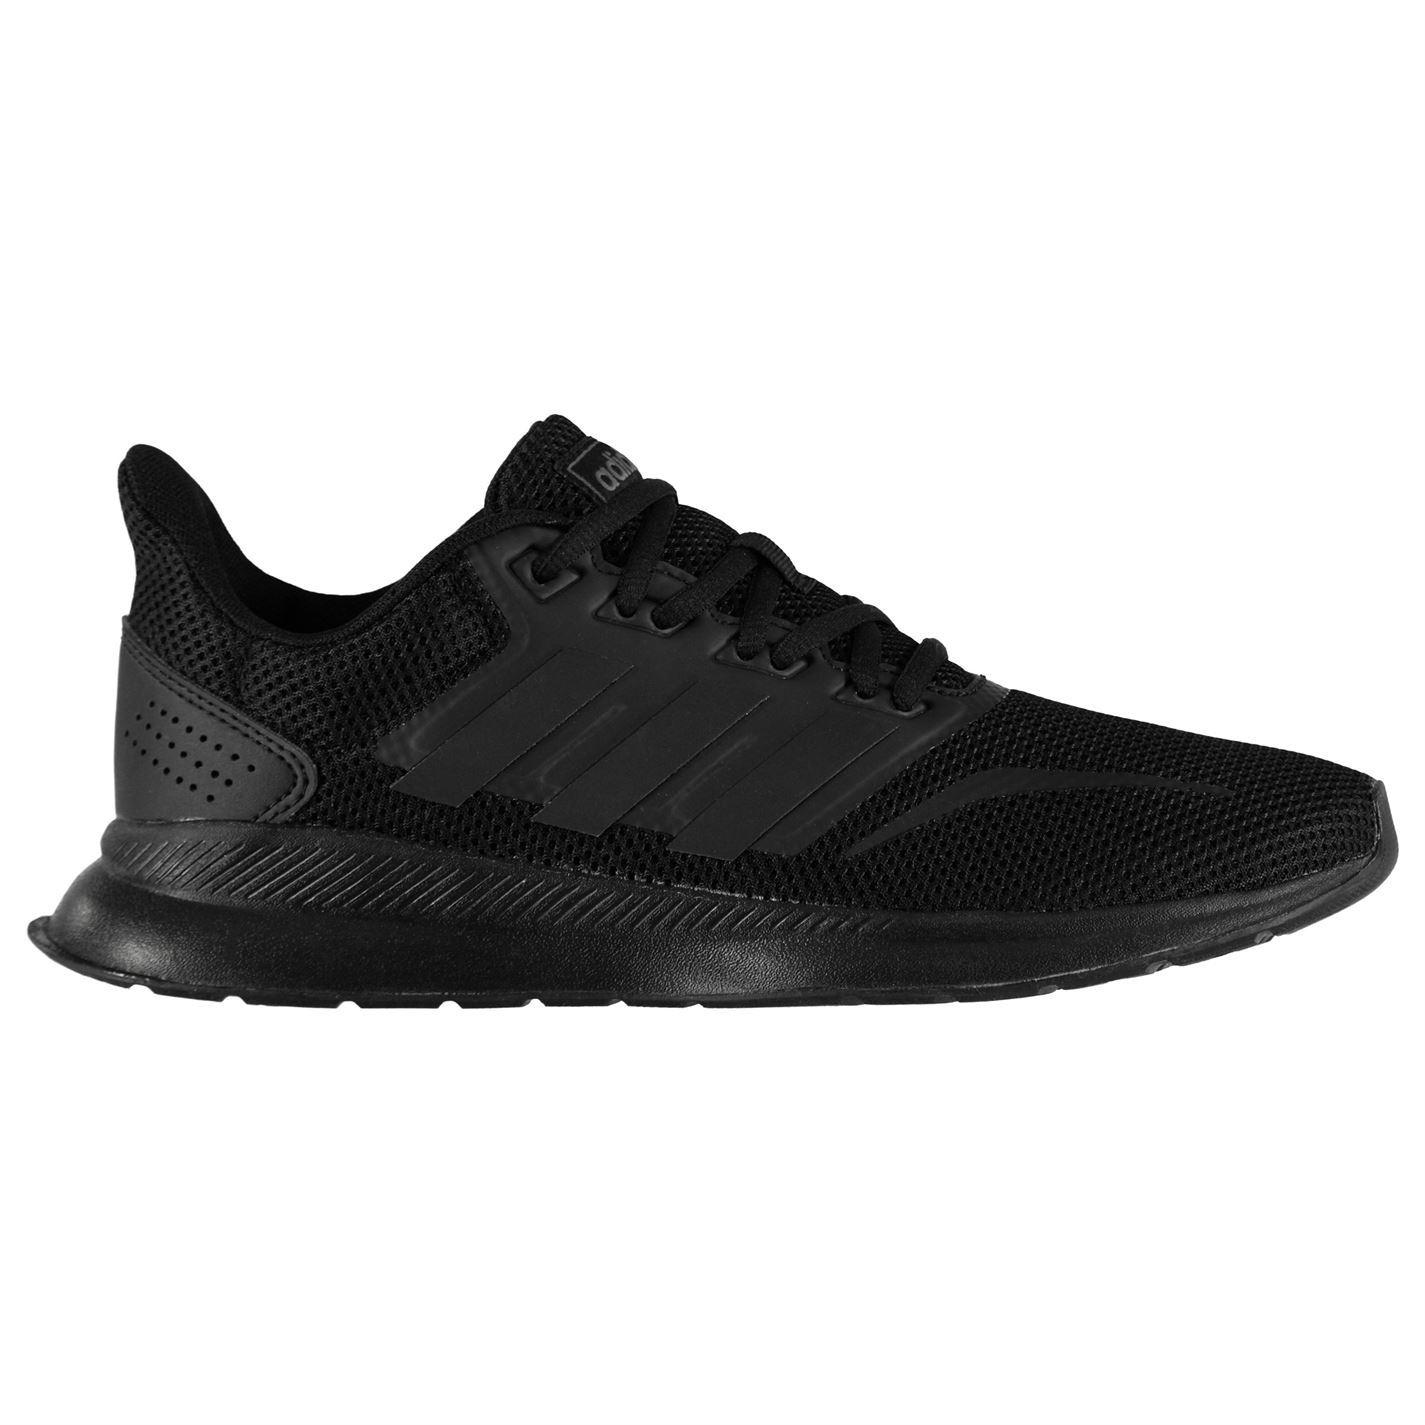 adidas-Falcon-Trainers-Junior-Boys-Shoes-Footwear thumbnail 4